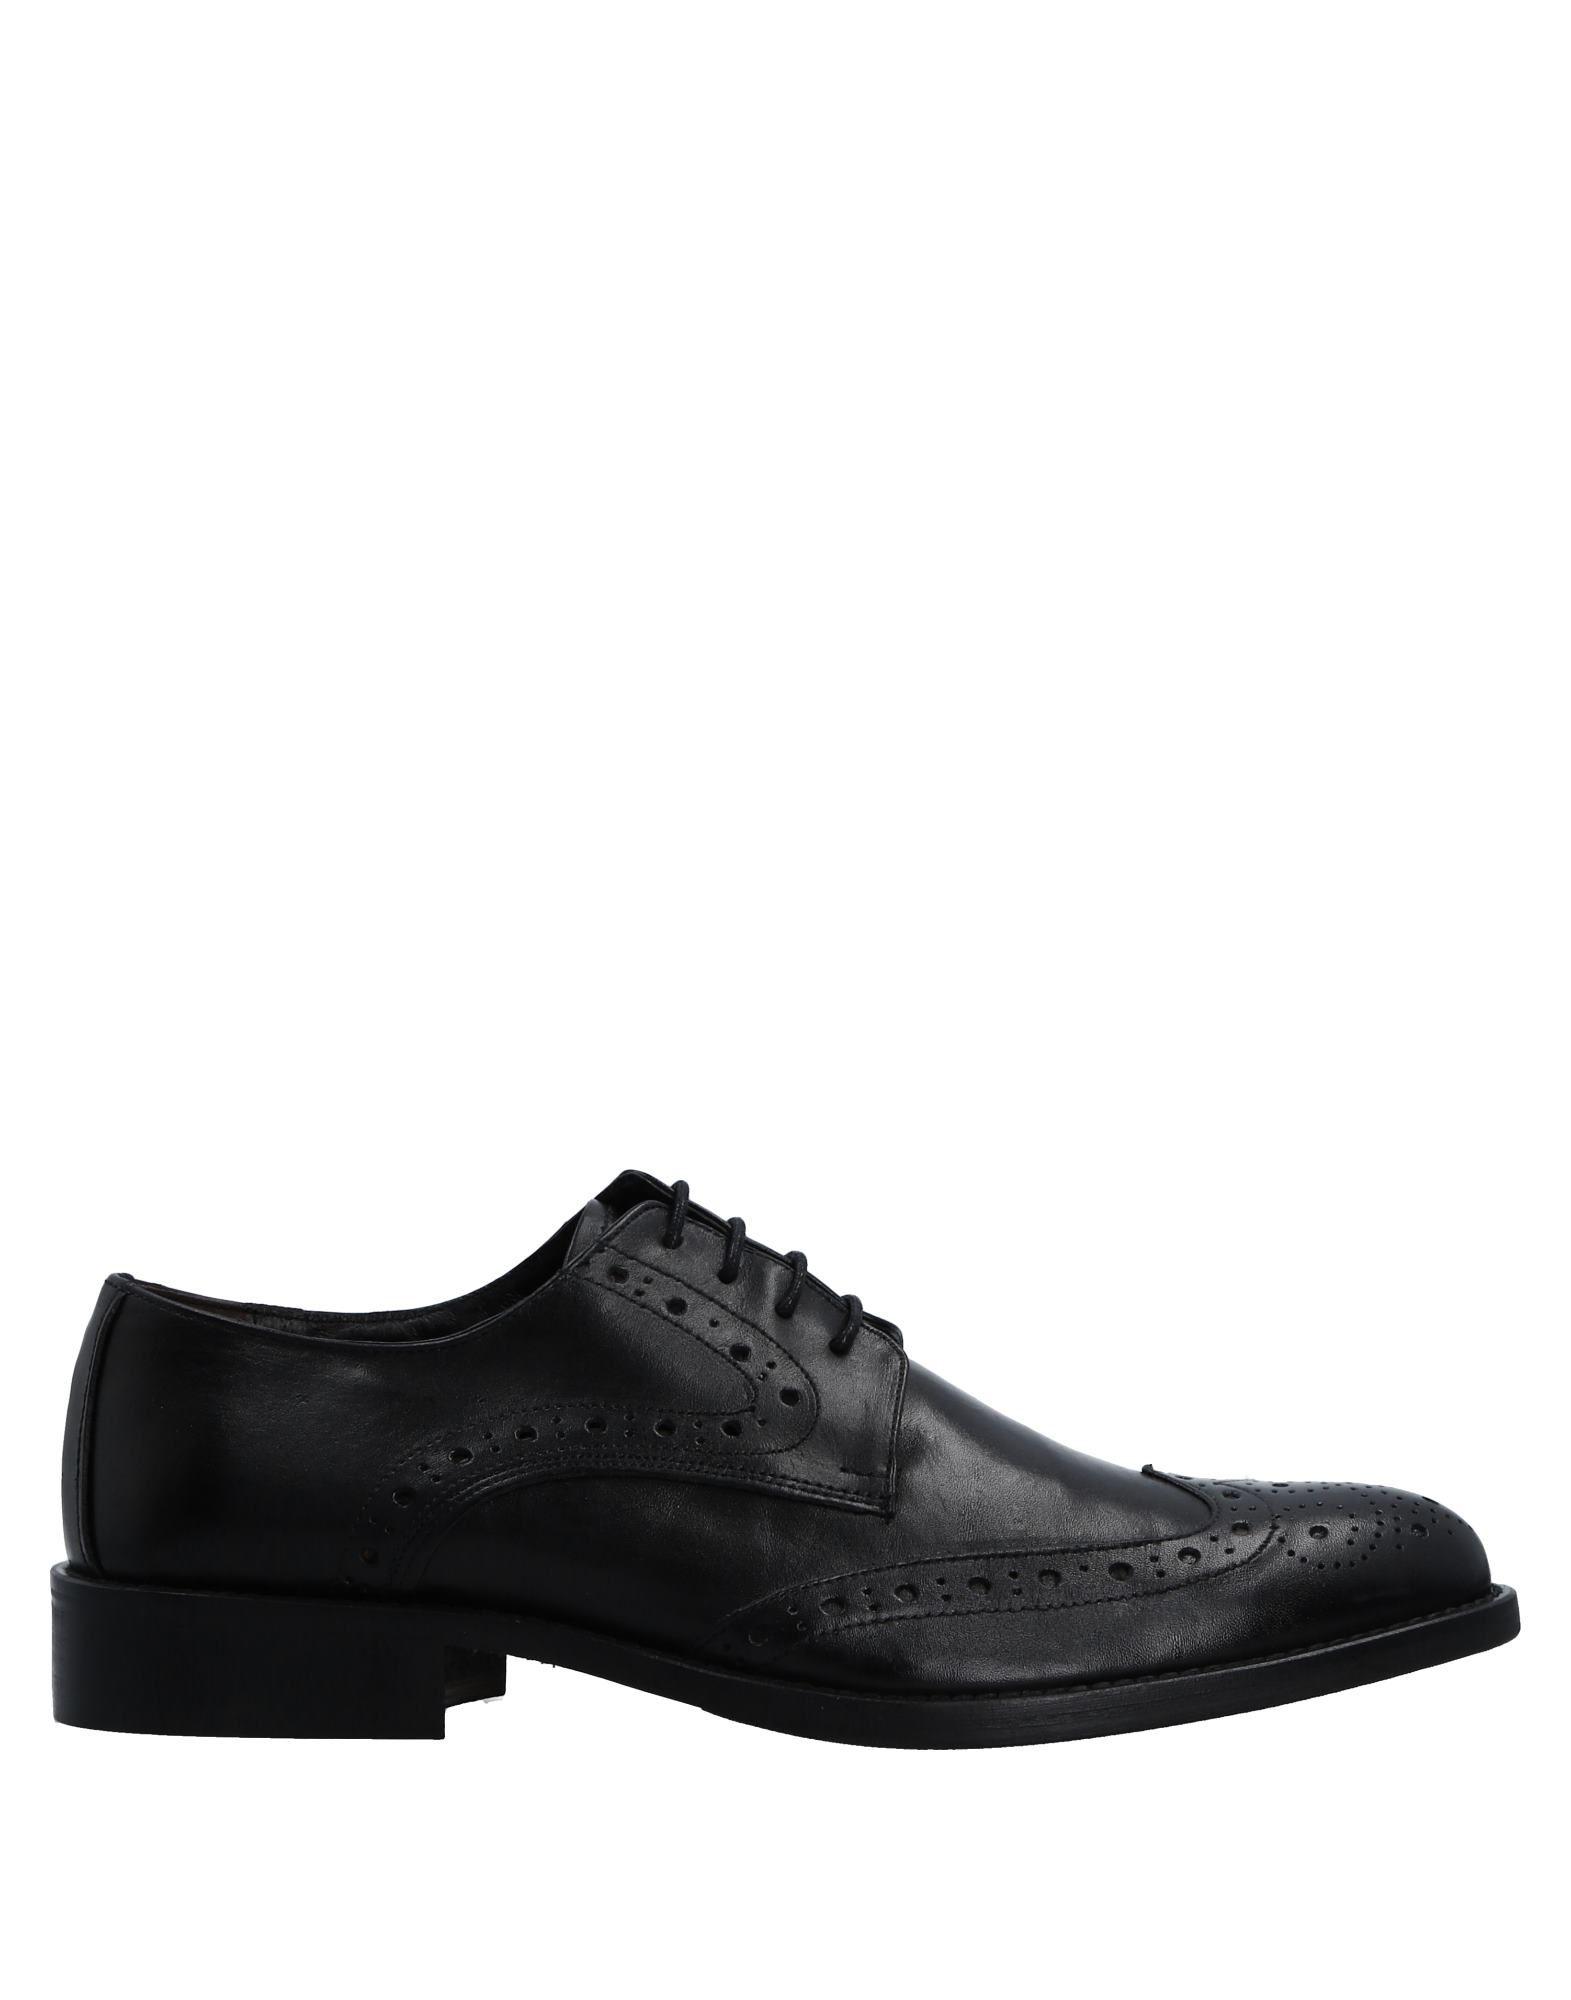 Rabatt echte Schuhe Brawn's Schnürschuhe Herren  11530216JD